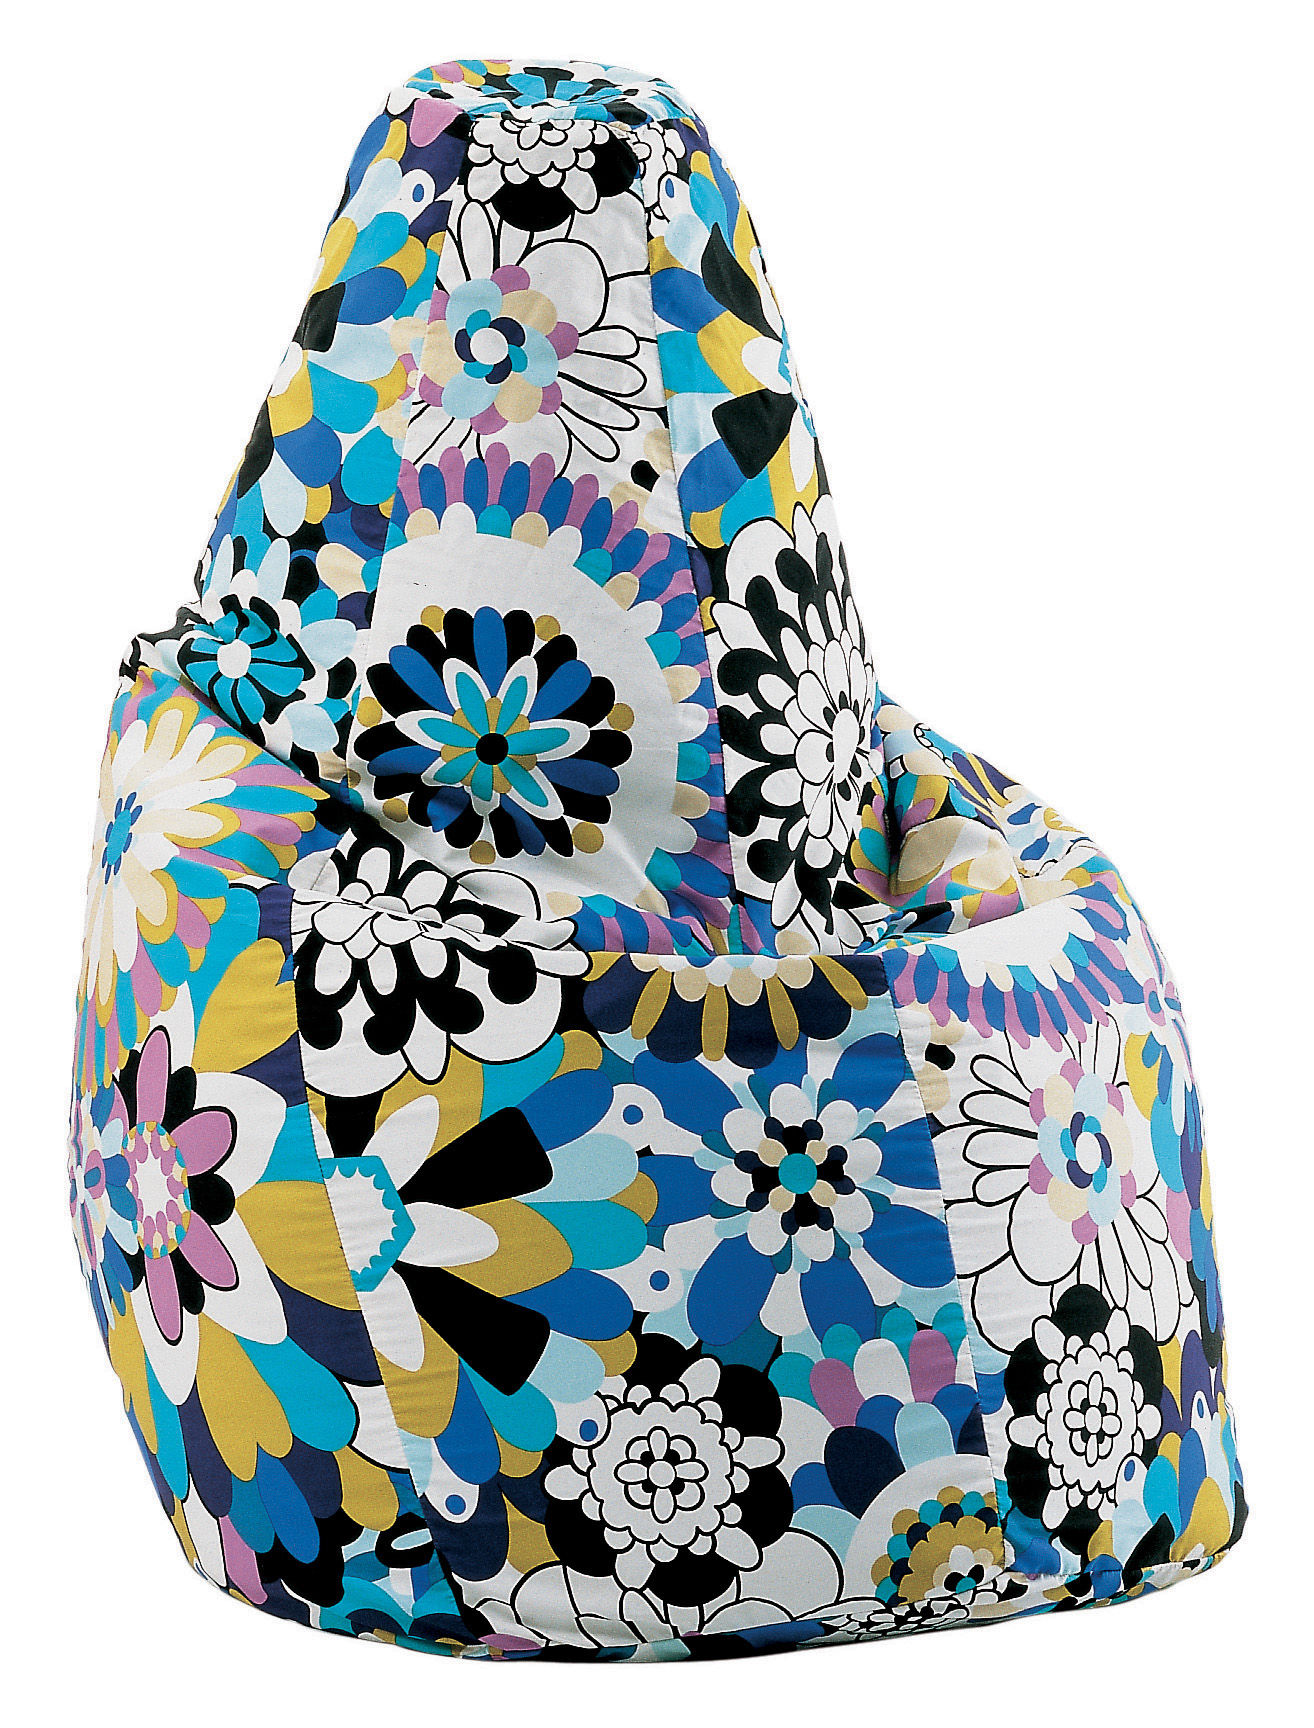 Scopri pouf sacco missoni blu di zanotta made in design for Sacco di zanotta